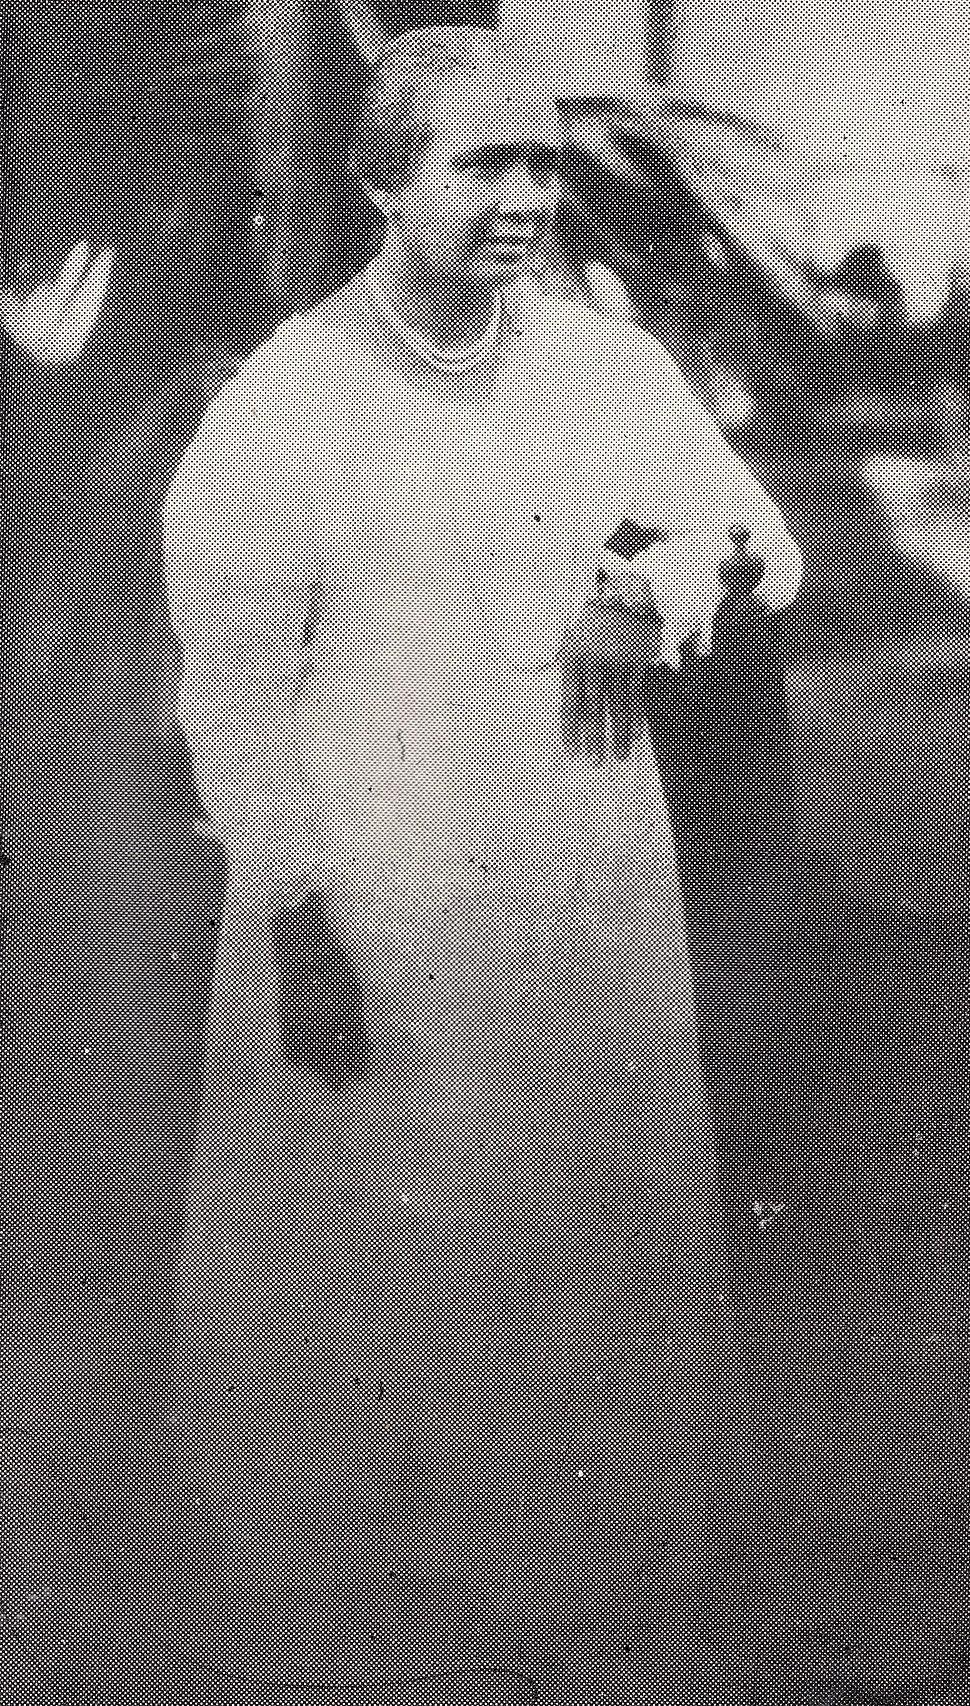 Mallino Pedris (Mother of Henry Pedris)